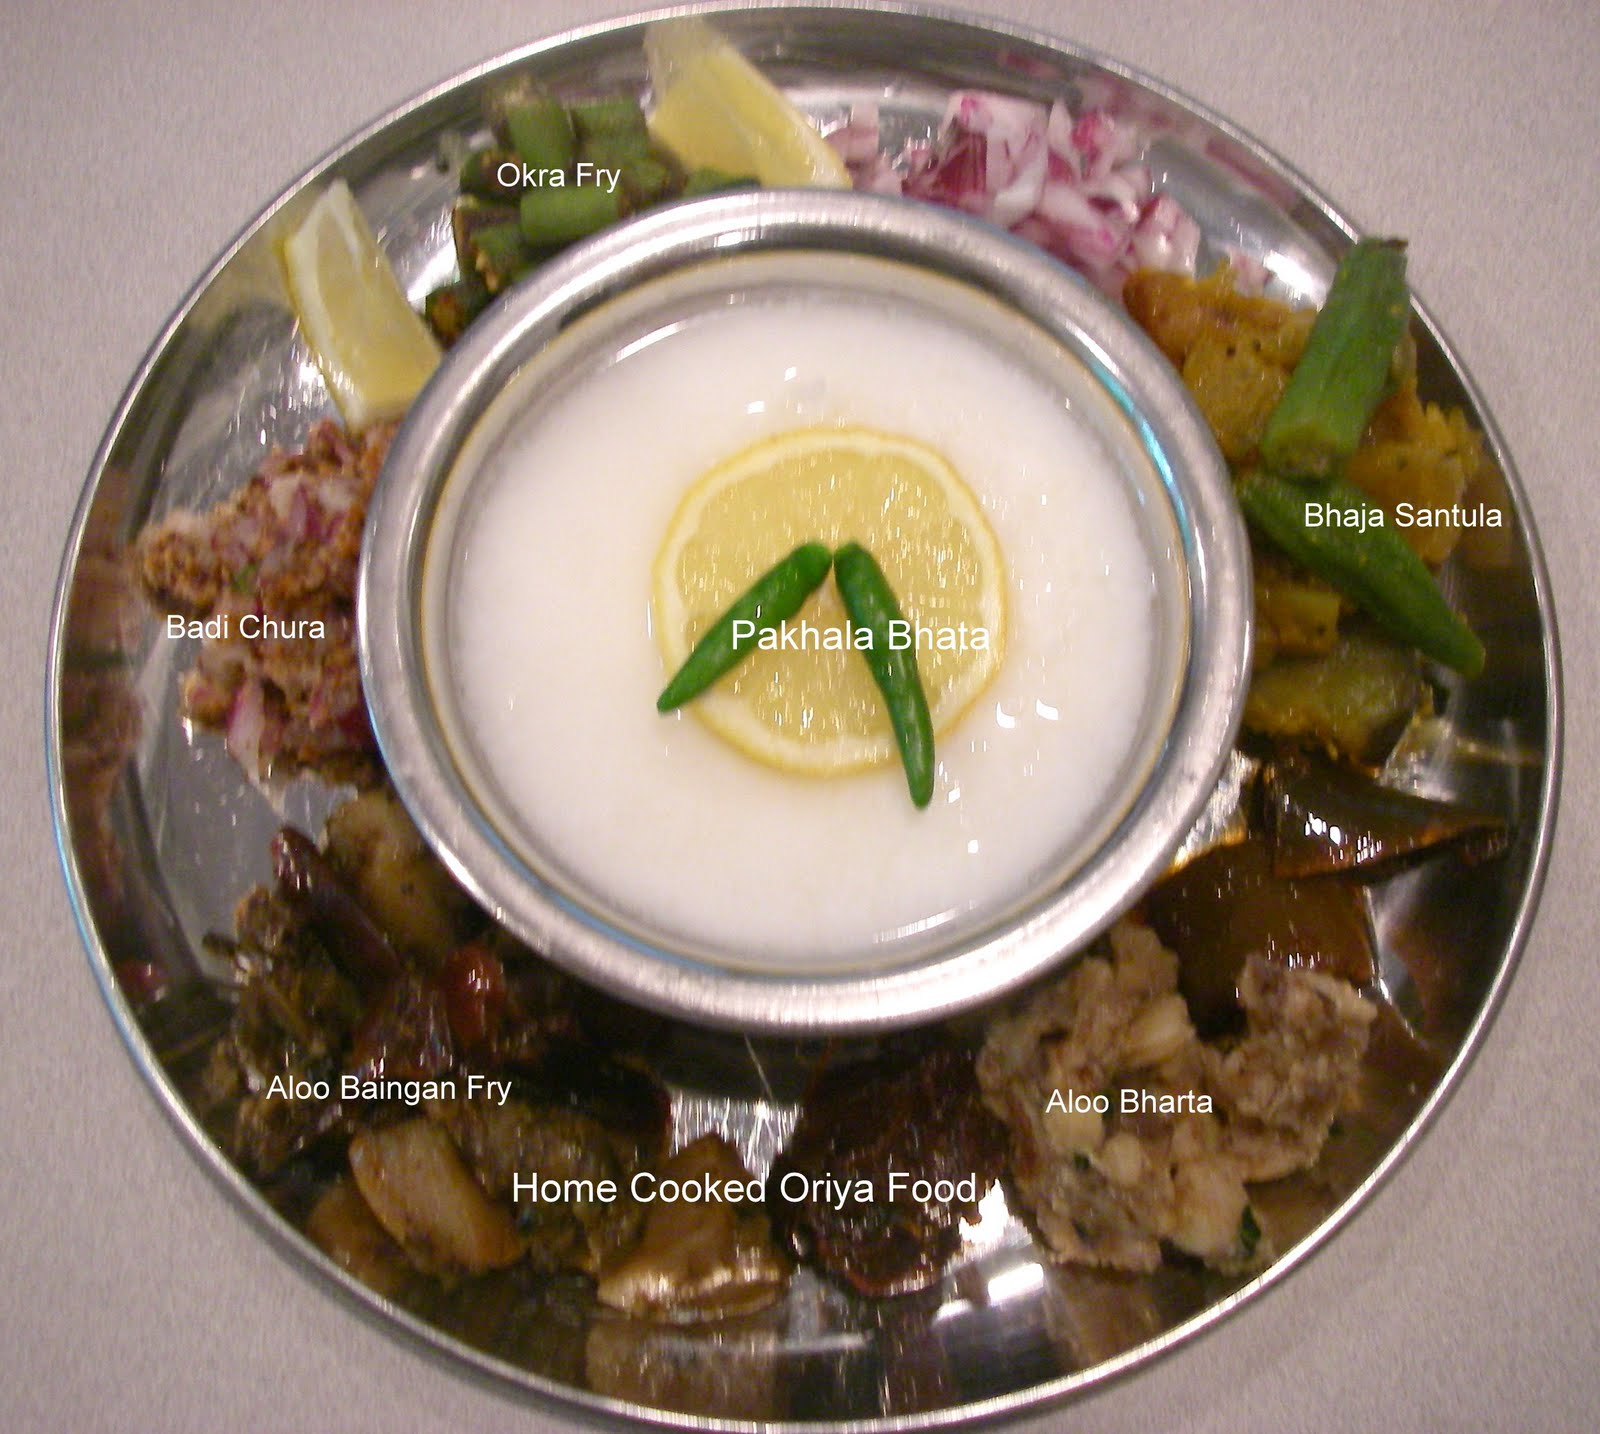 Oriya food summer feast with pakhala bhata summer feast with pakhala bhata forumfinder Image collections